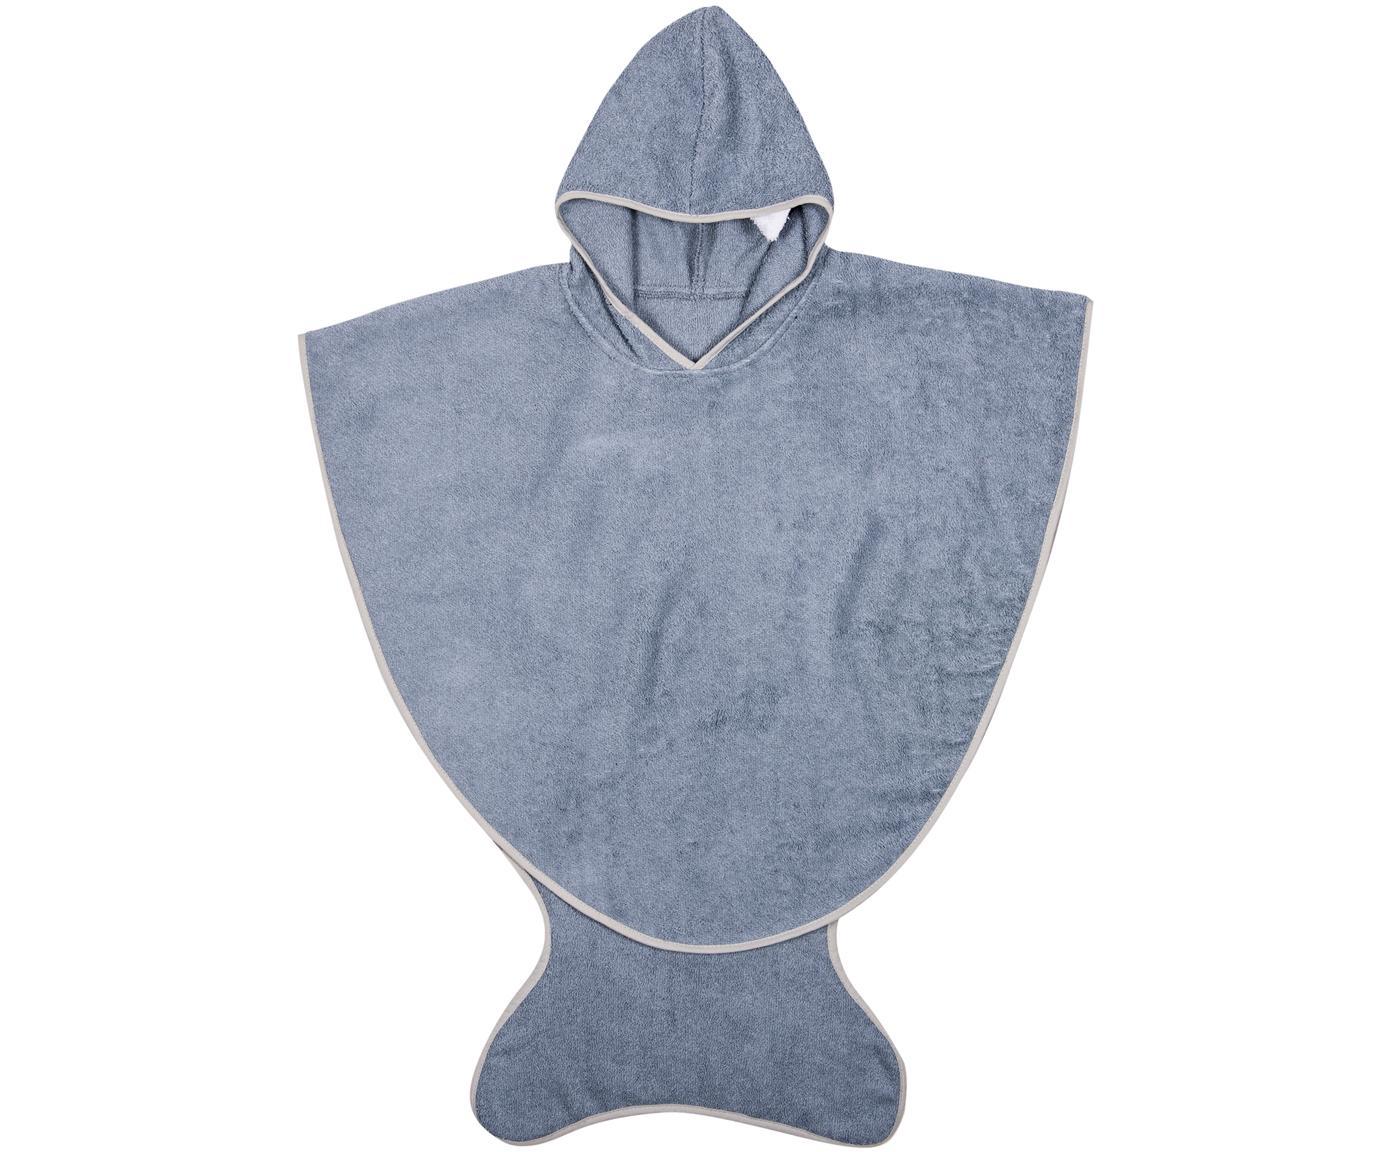 Asciugamano per bambini Fish, Cotone, Blu grigio, Larg. 71 x Alt. 87 cm